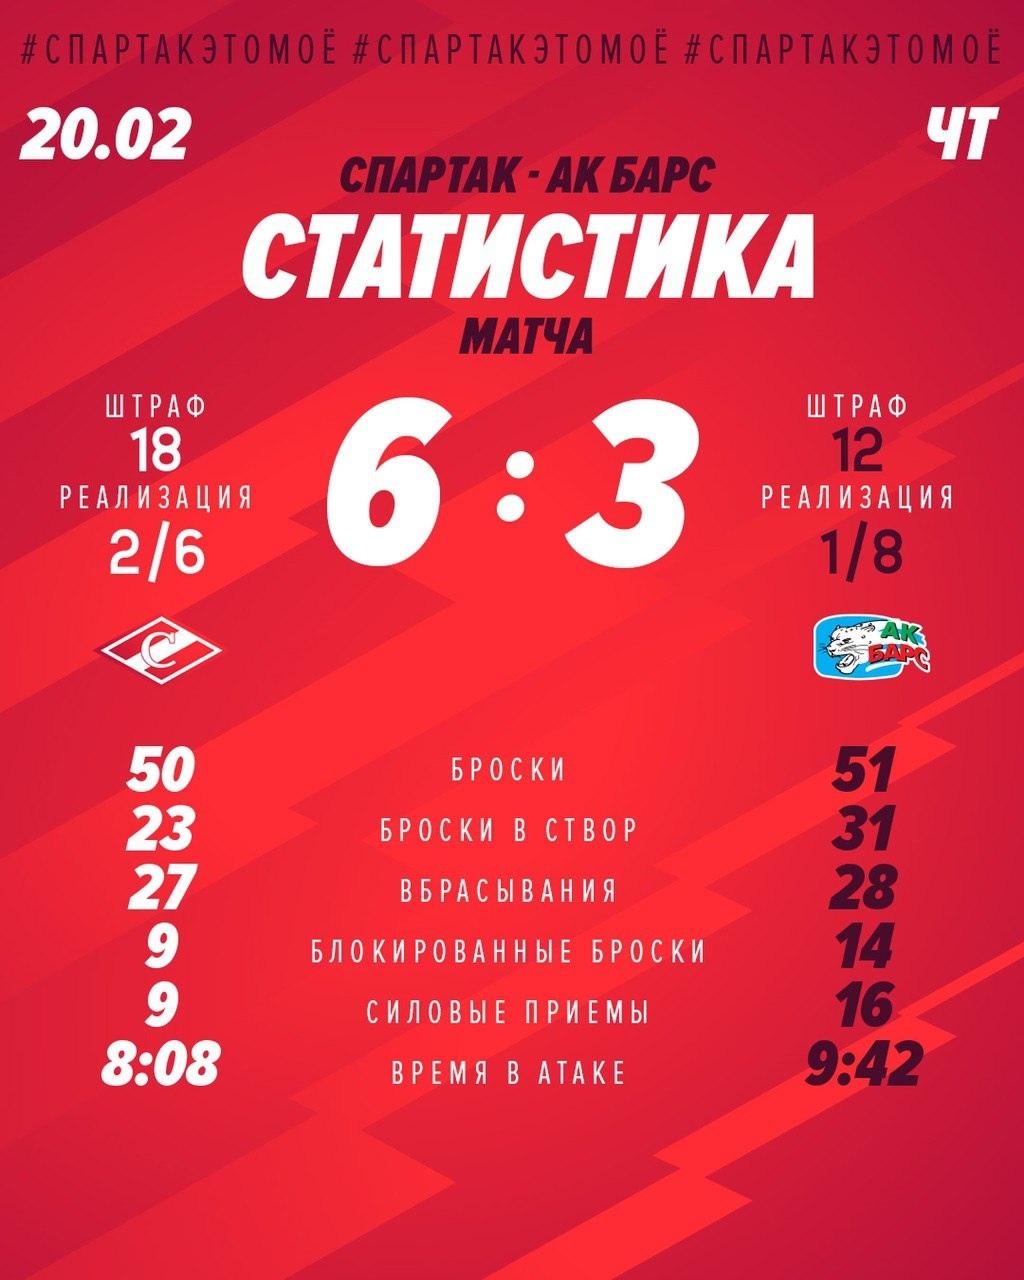 Статистика матча «Спартак» - «Ак Барс» 6:3